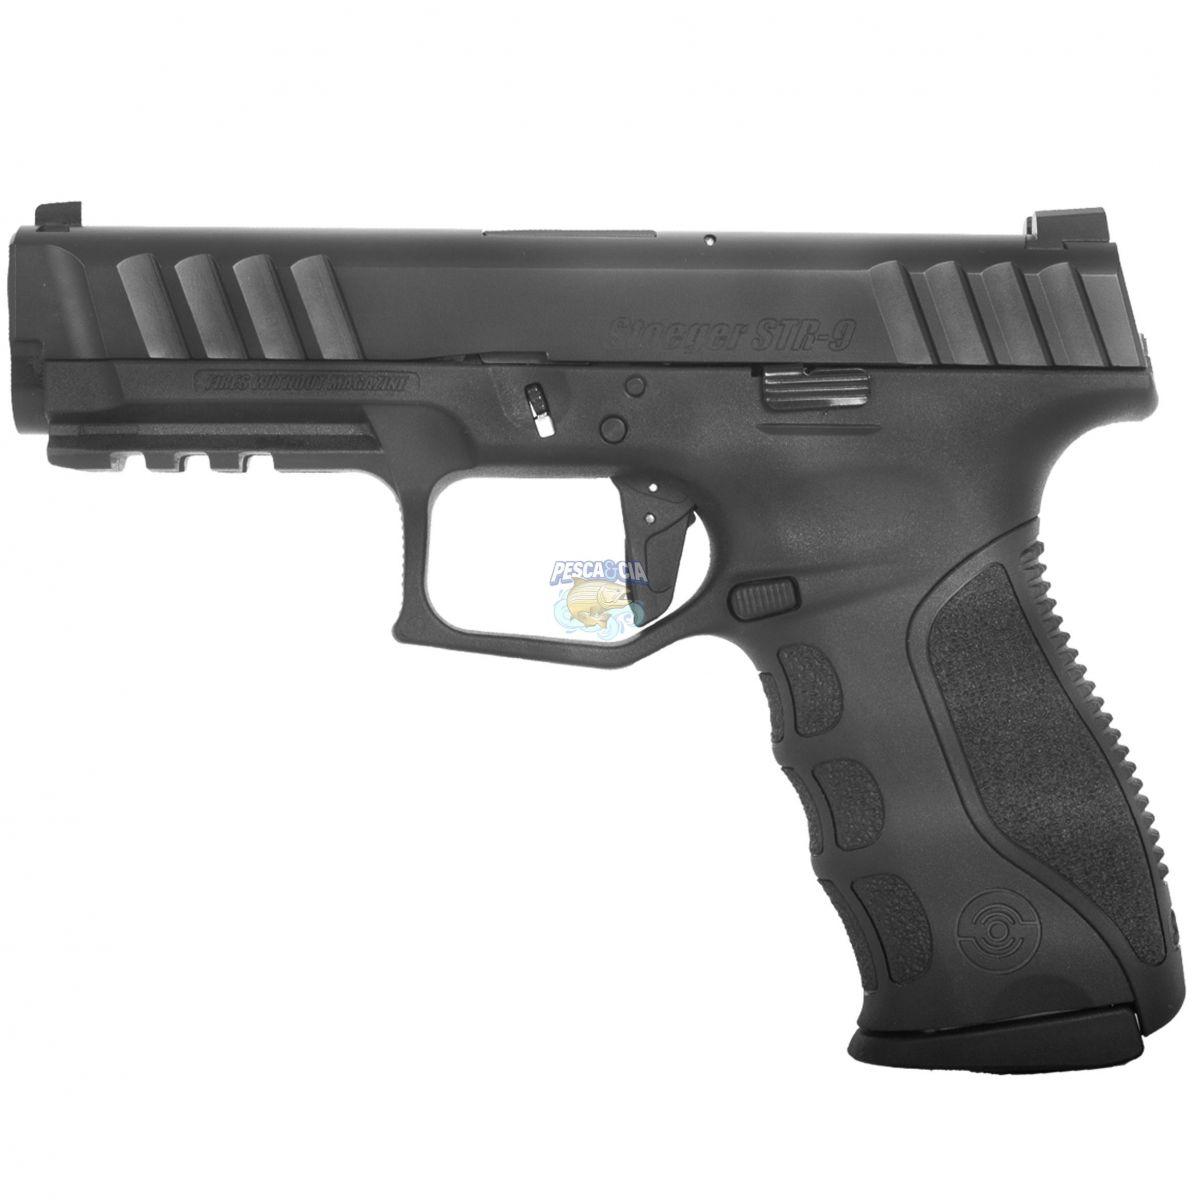 "Pistola Stoeger By.Beretta STR-9 Cal. 9mm Oxidada 15 Tiros - Cano 4,17"""